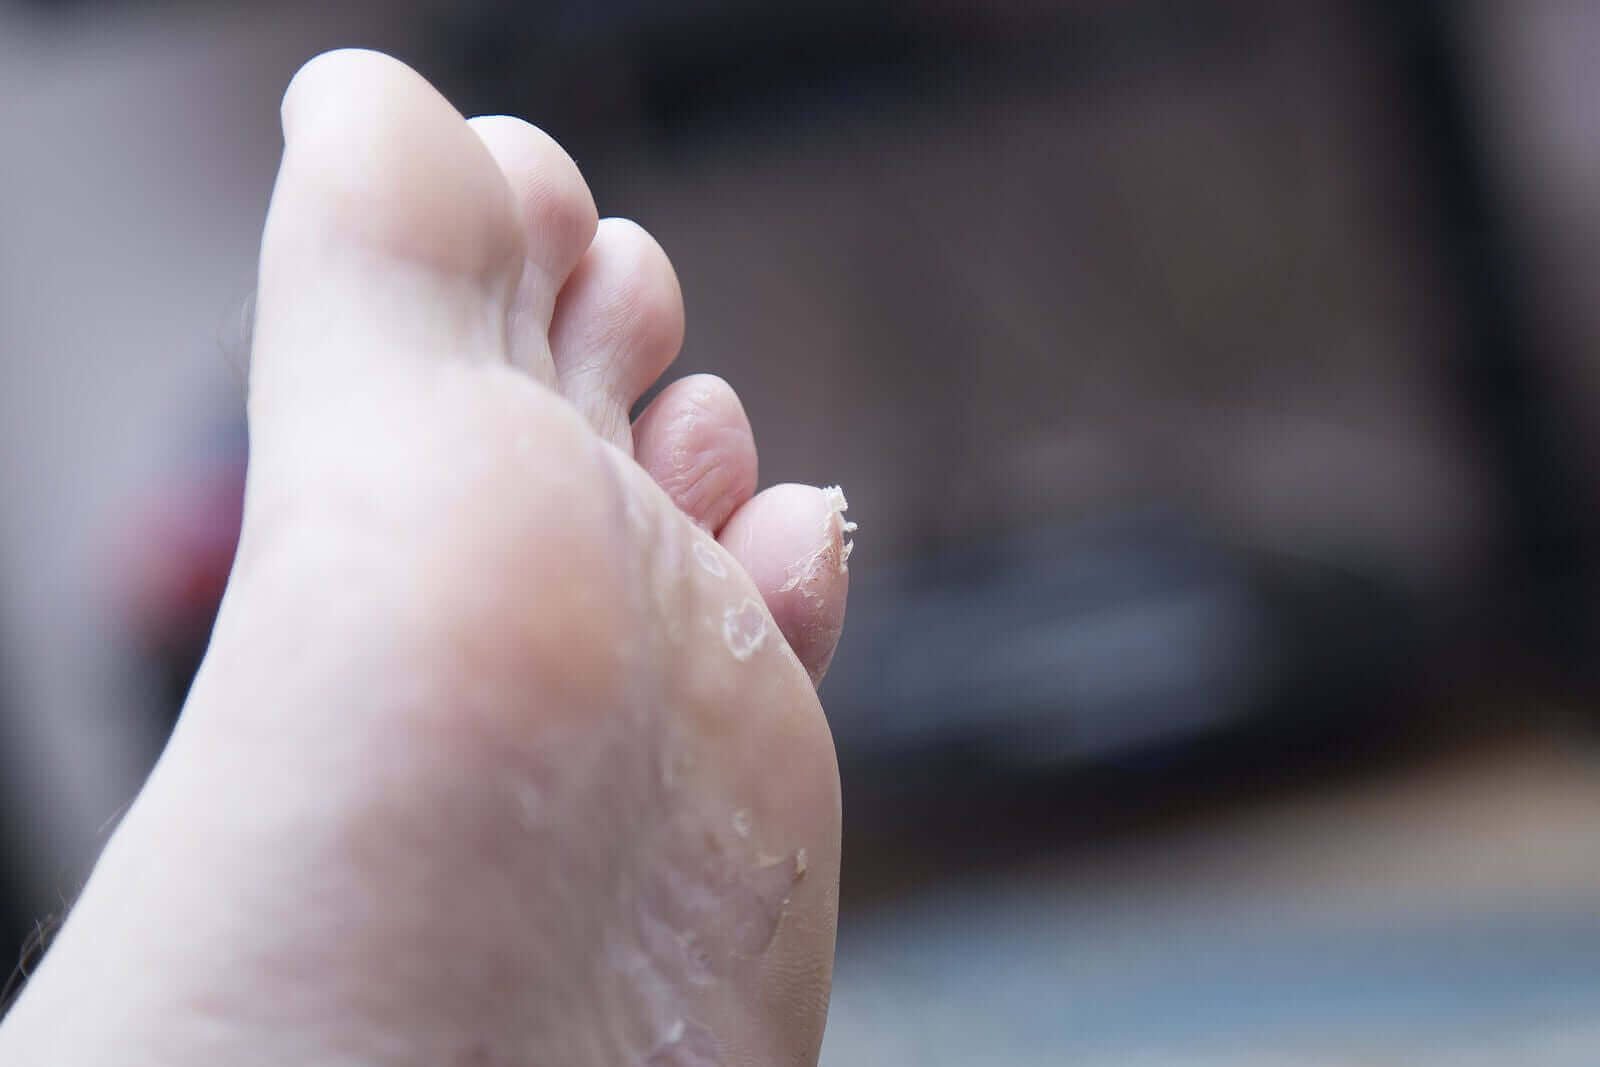 Jalkapohjan ihotulehdus lapsella